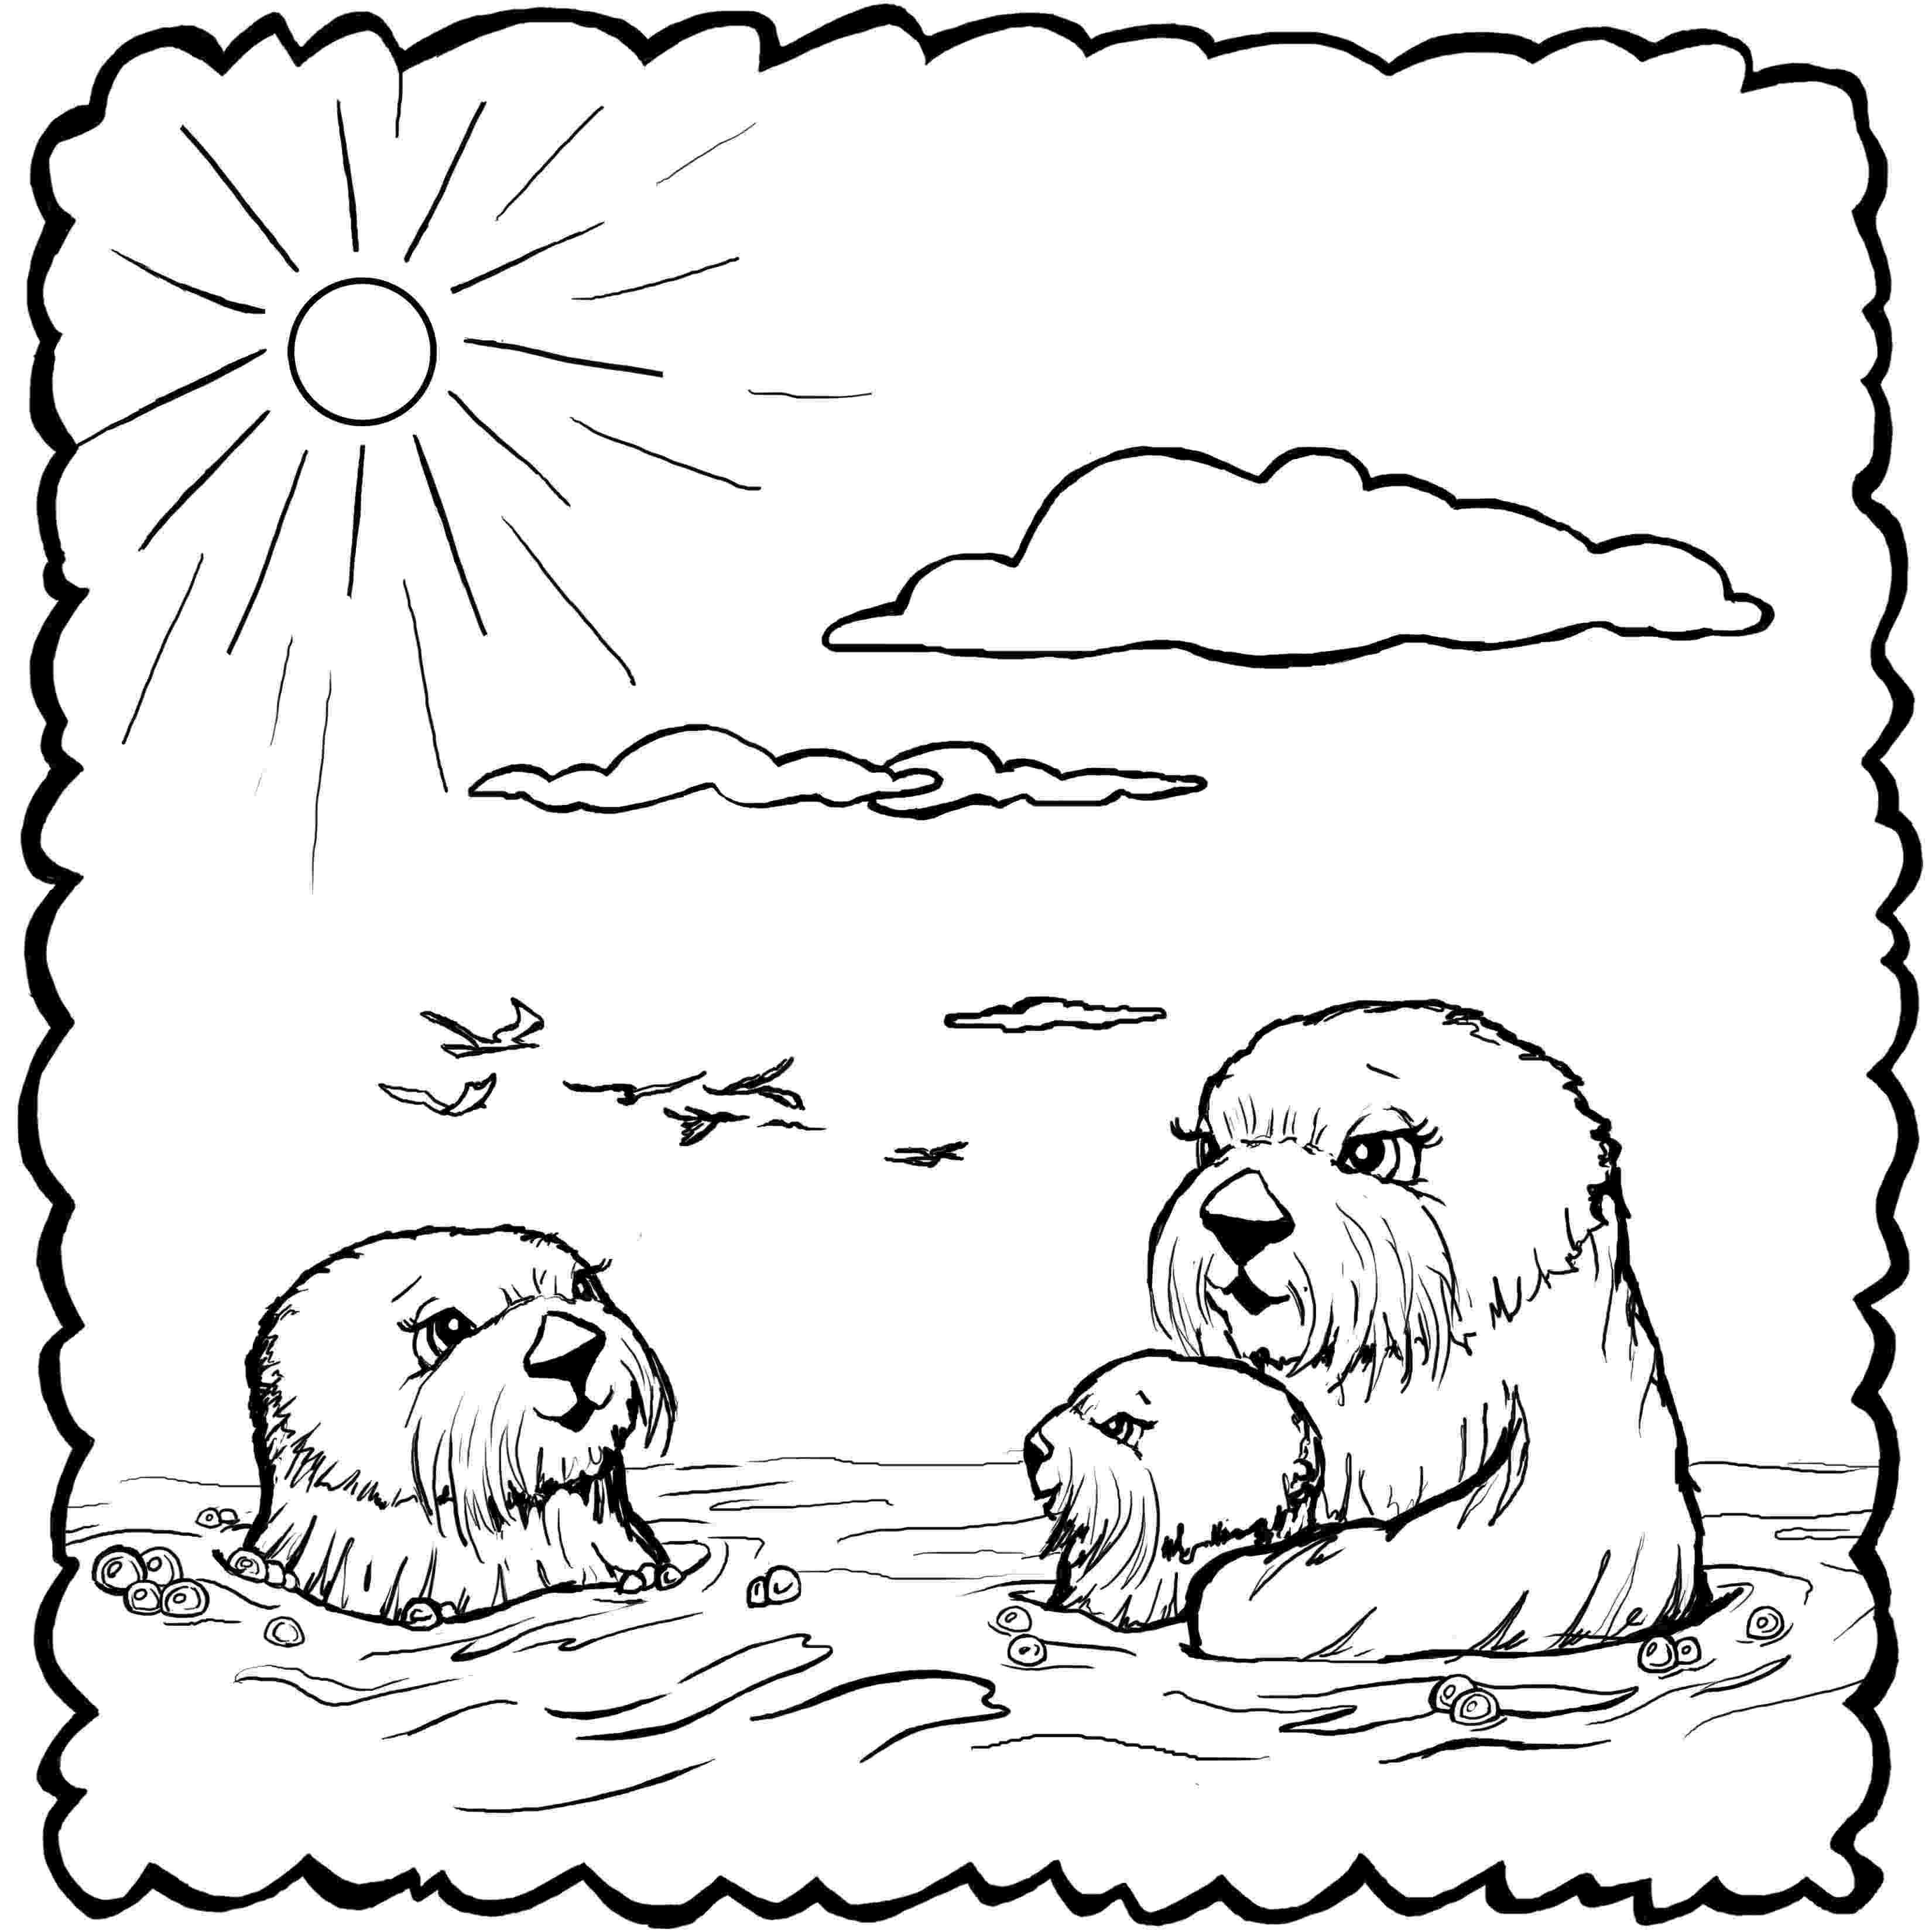 otter coloring pages free otter coloring pages otter coloring pages